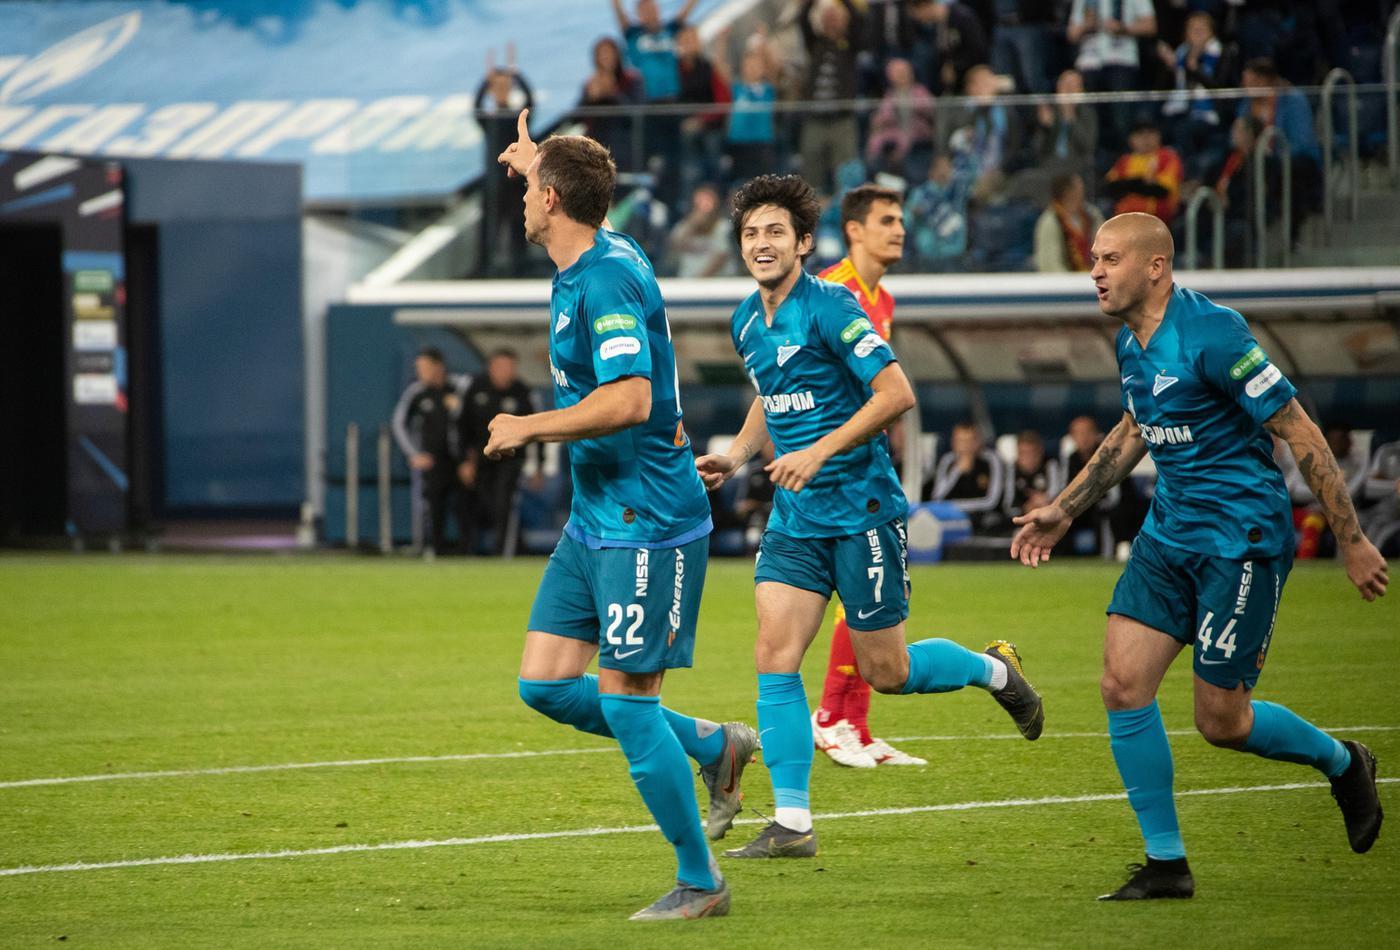 Дзюба забил «Лиону» три гола в двух матчах. Во Франции справится без Азмуна? - фото